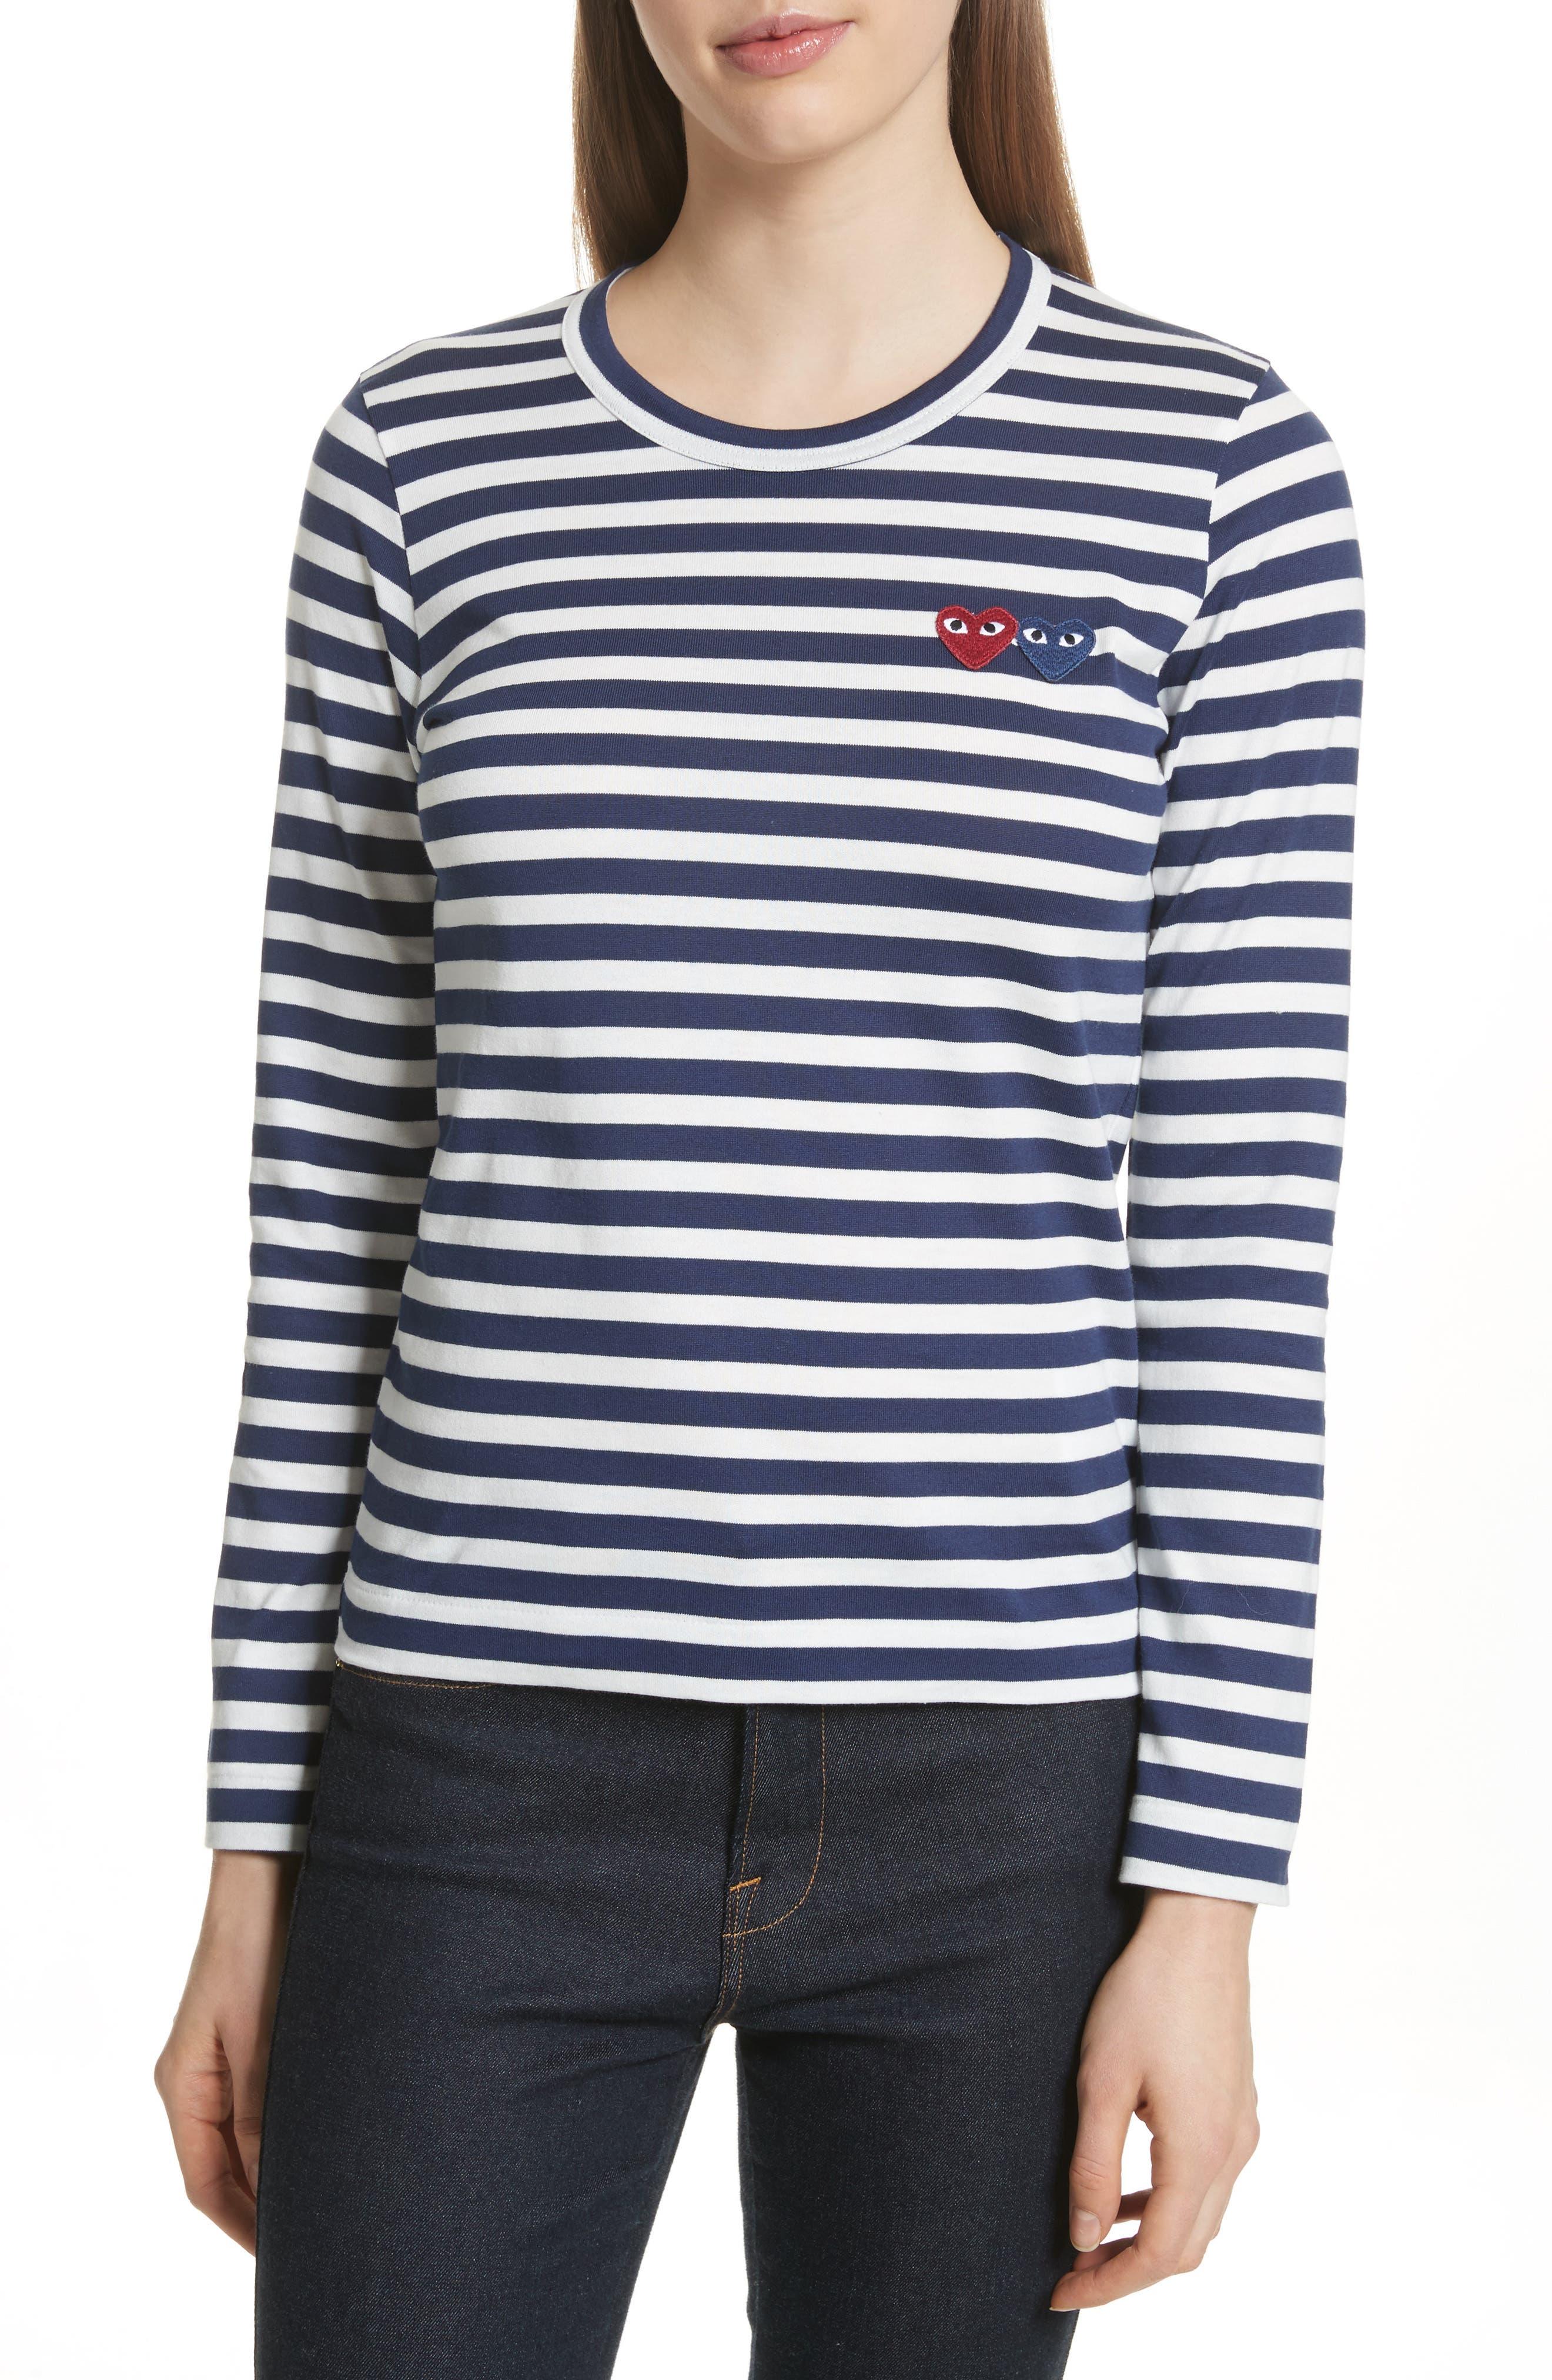 PLAY Double Heart Stripe Tee,                         Main,                         color, Navy